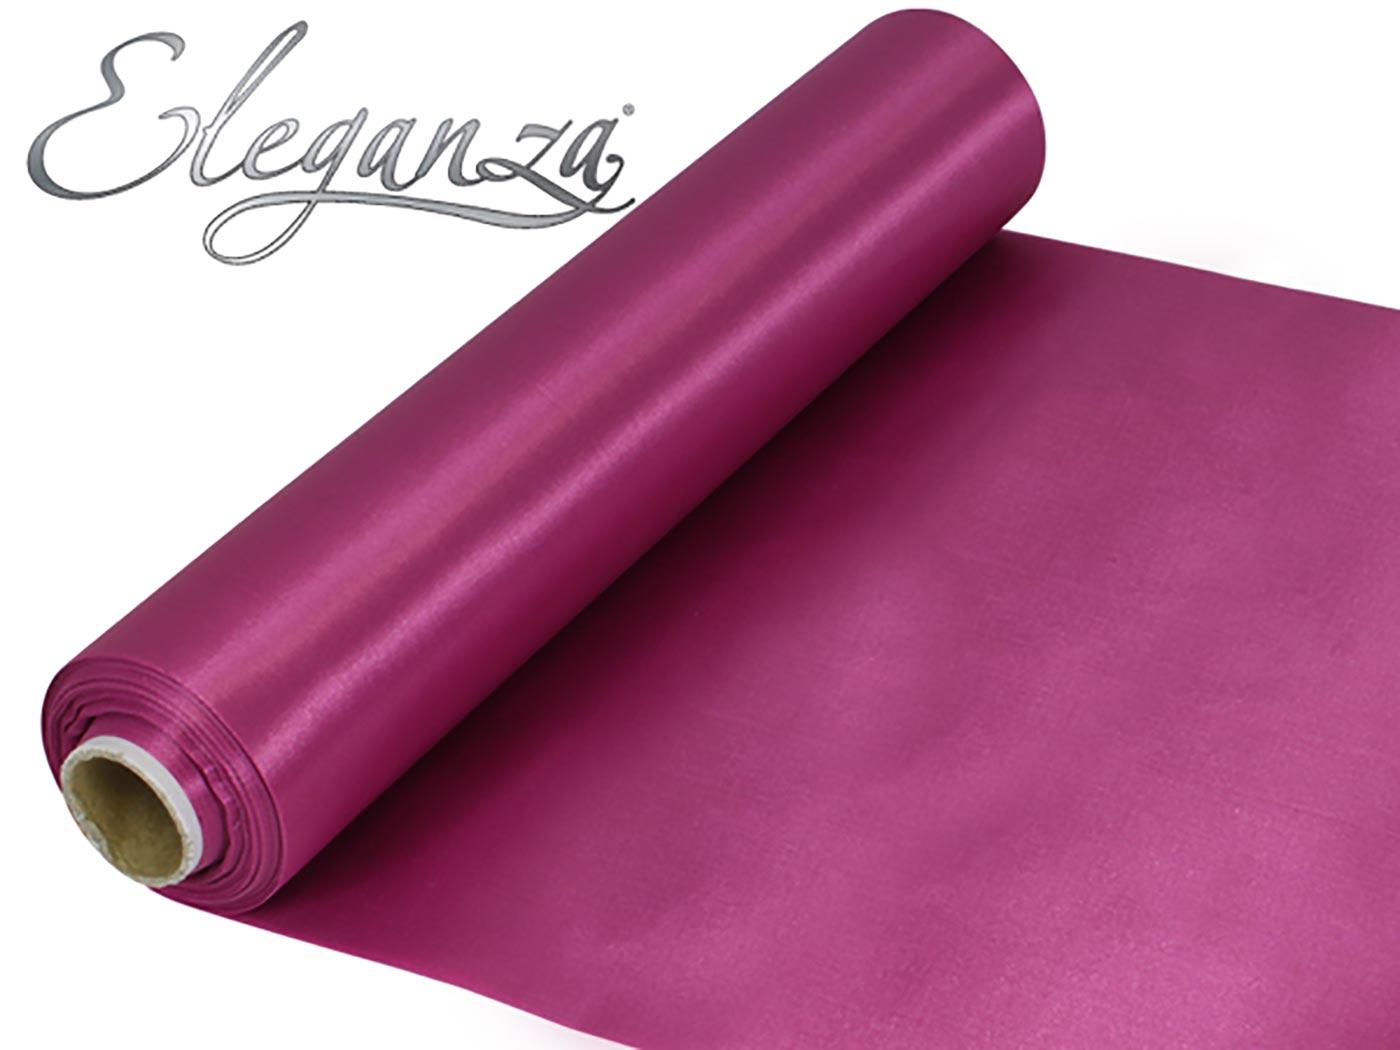 Eleganza Satin Fabric 29cm x 20m Rose Pink